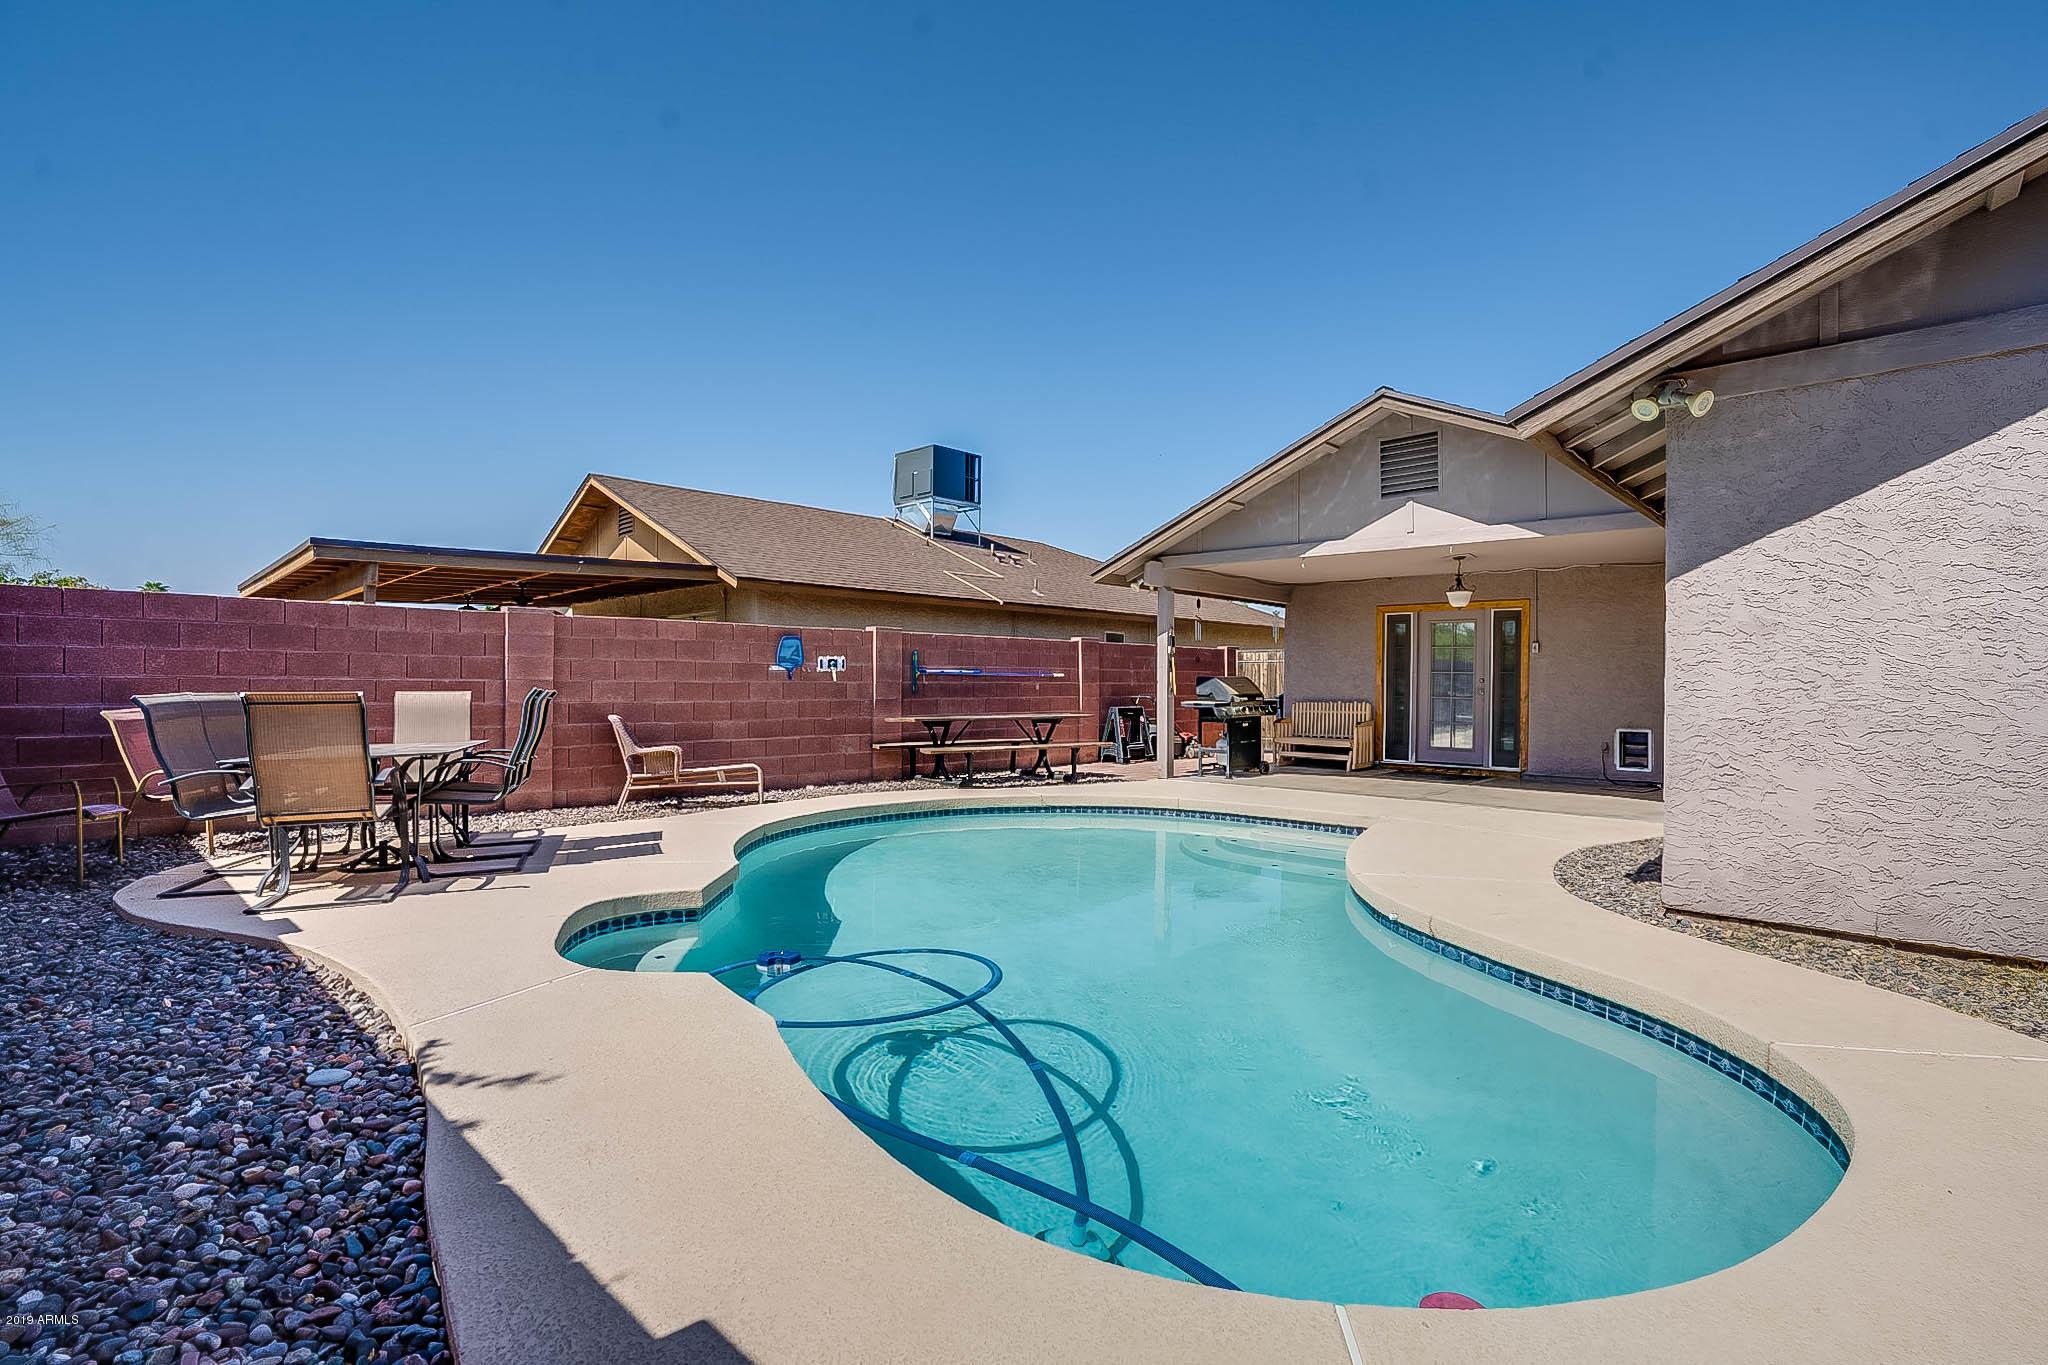 MLS 5952731 14645 N 62ND Avenue, Glendale, AZ 85306 Glendale AZ North Glendale